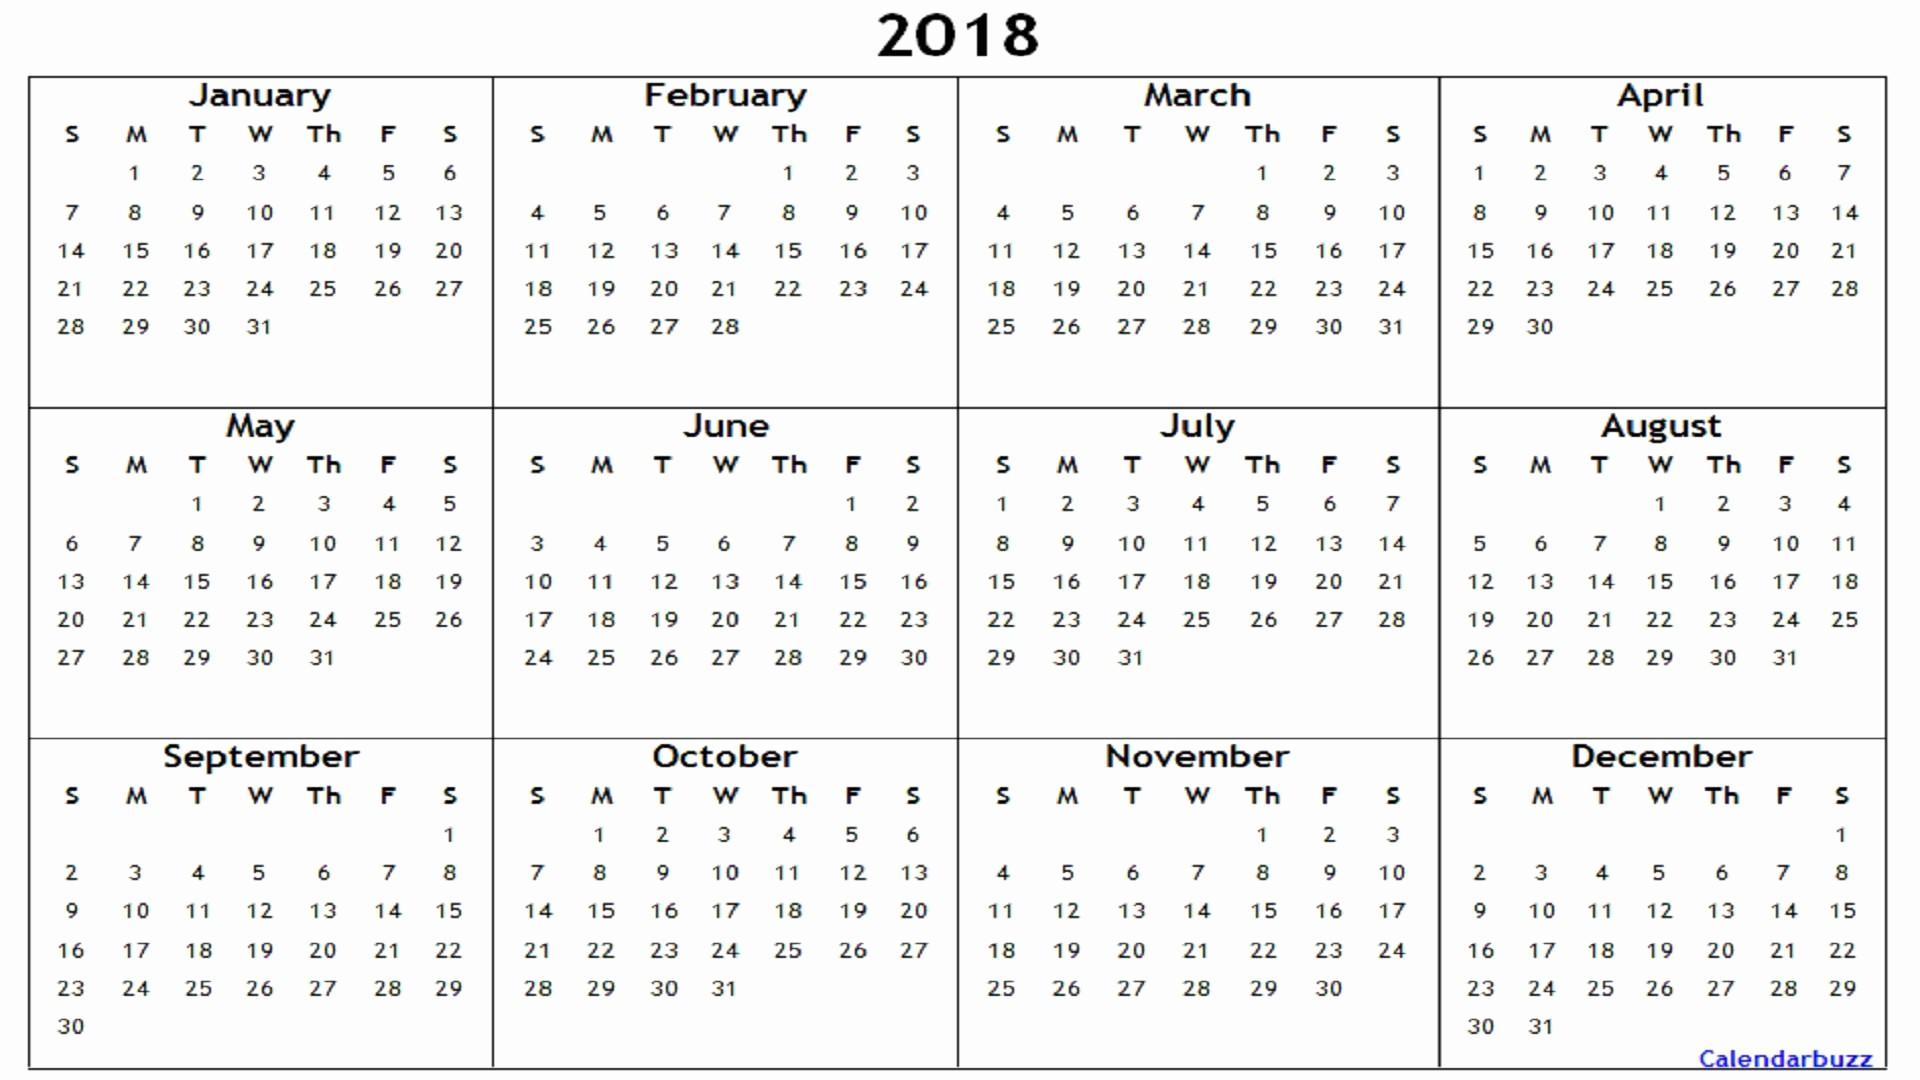 Microsoft Word 2018 Calendar Templates Fresh 2018 Yearly Calendar Printable Templates Word Excel